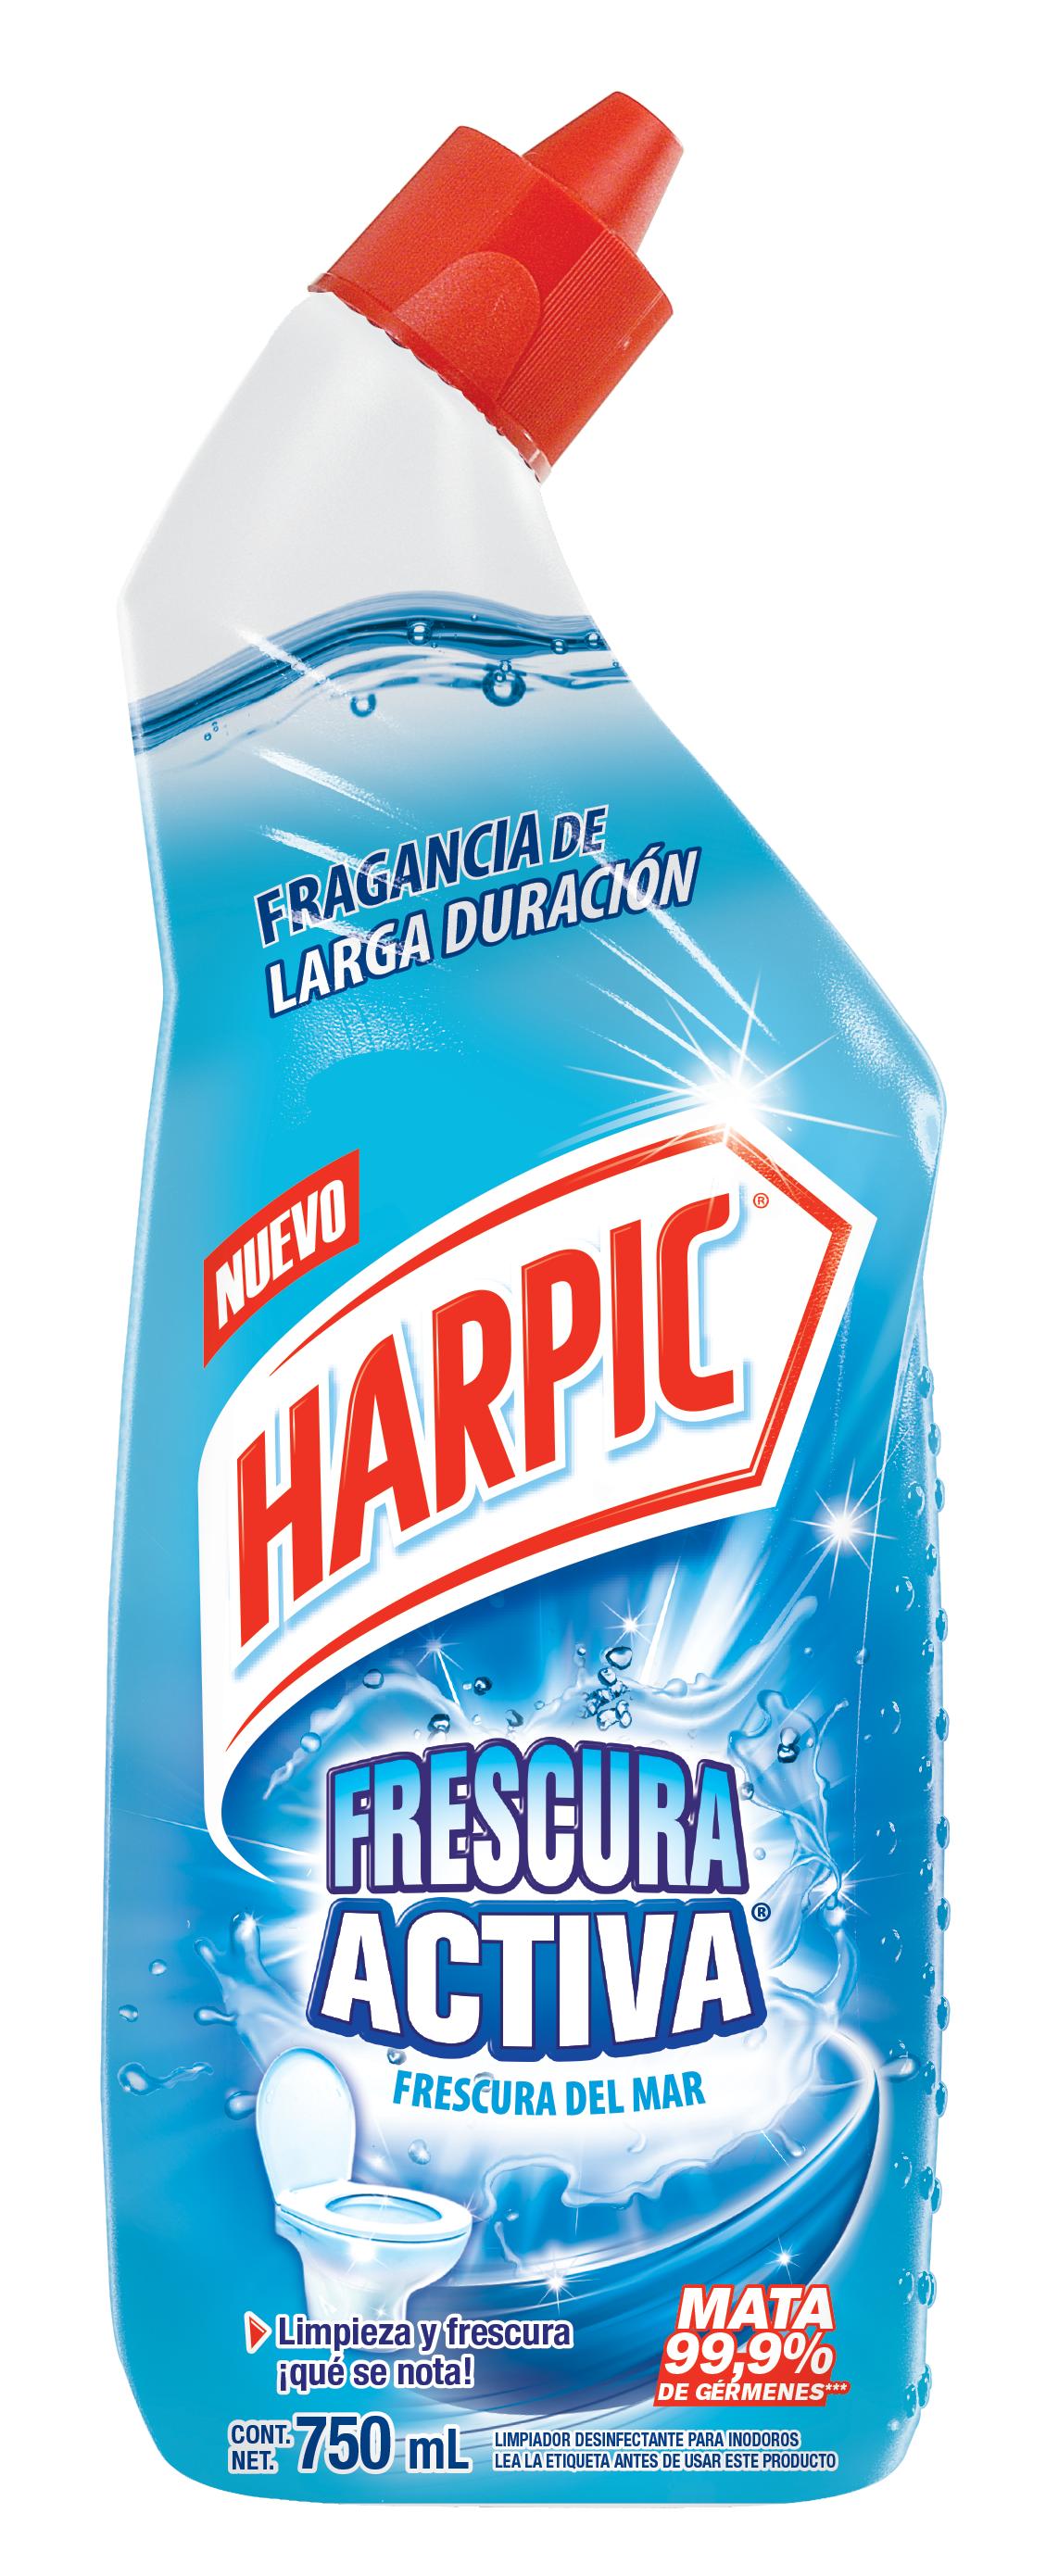 Harpic® Frescura Activa Frescura Marina 750ml